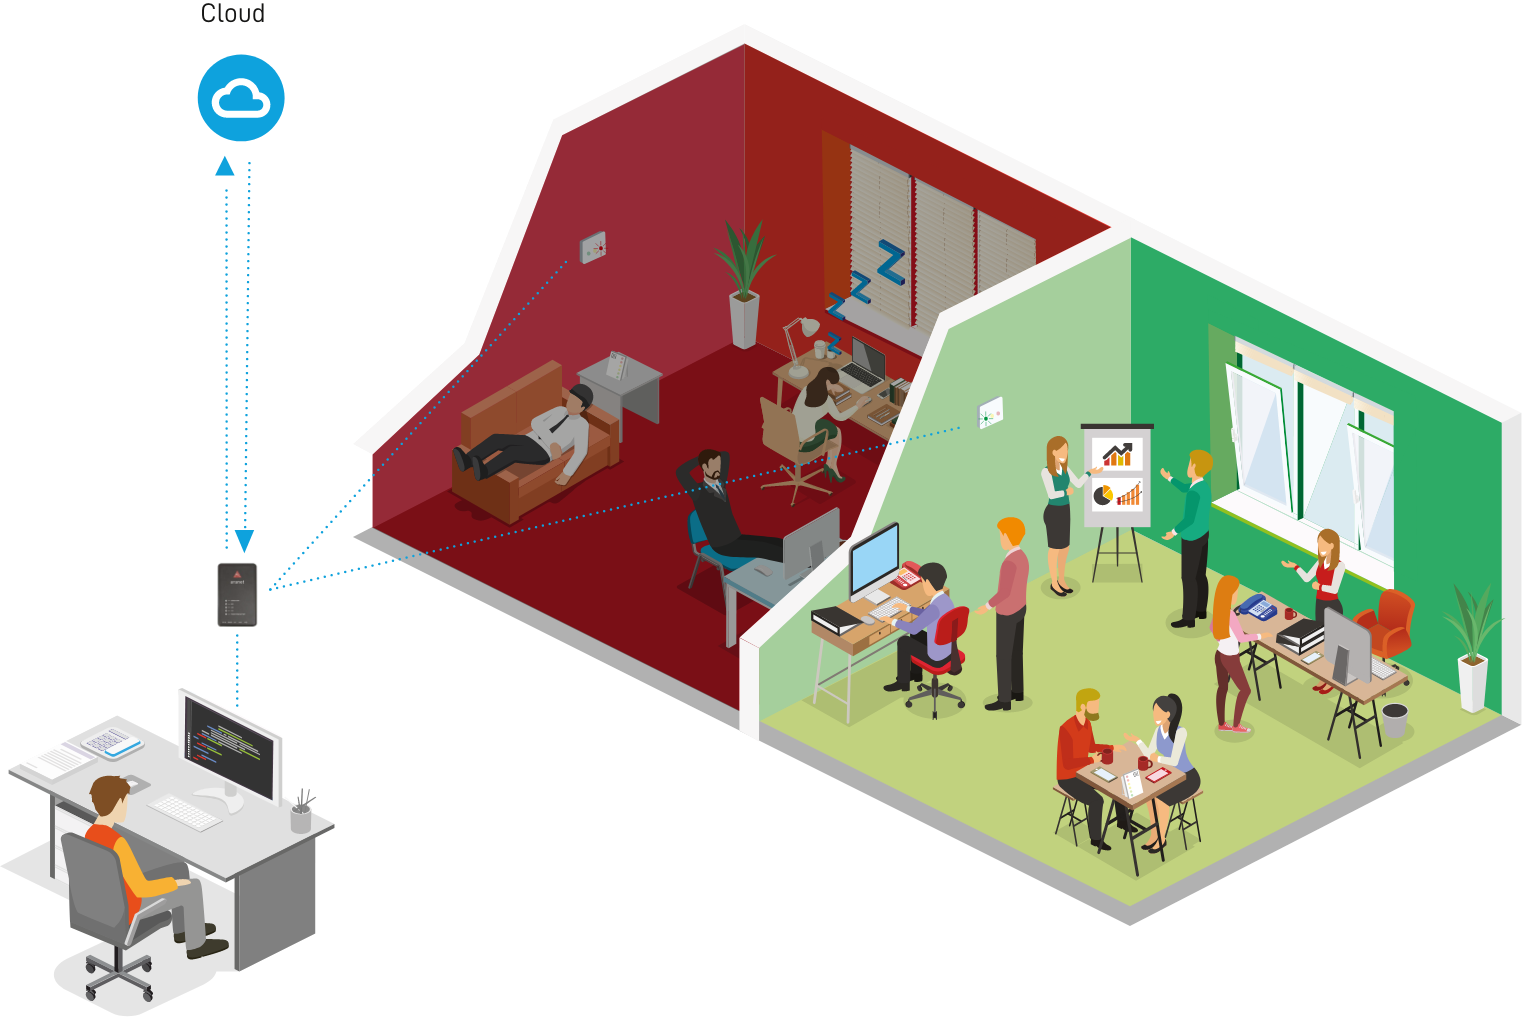 An image illustrating how OMNI's data logging sensors work